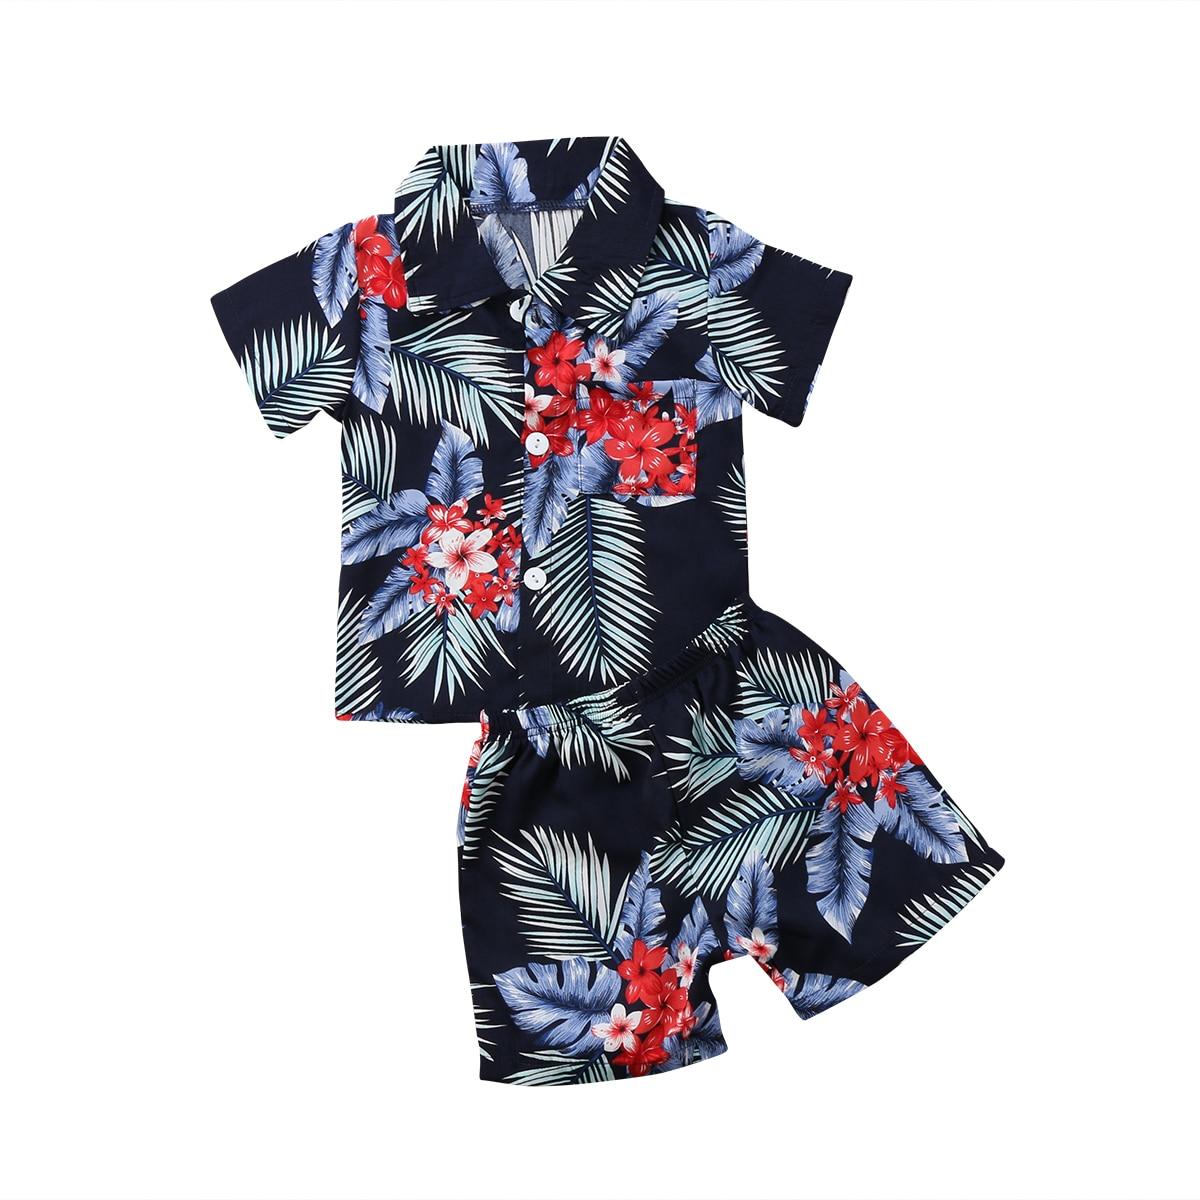 2018 lässige Newborn Kleinkind Kinder Baby Junge Strand Kleidung Kurzarm T-shirt T-stück Tops + Pants Floral 2 STÜCKE Outfits Set